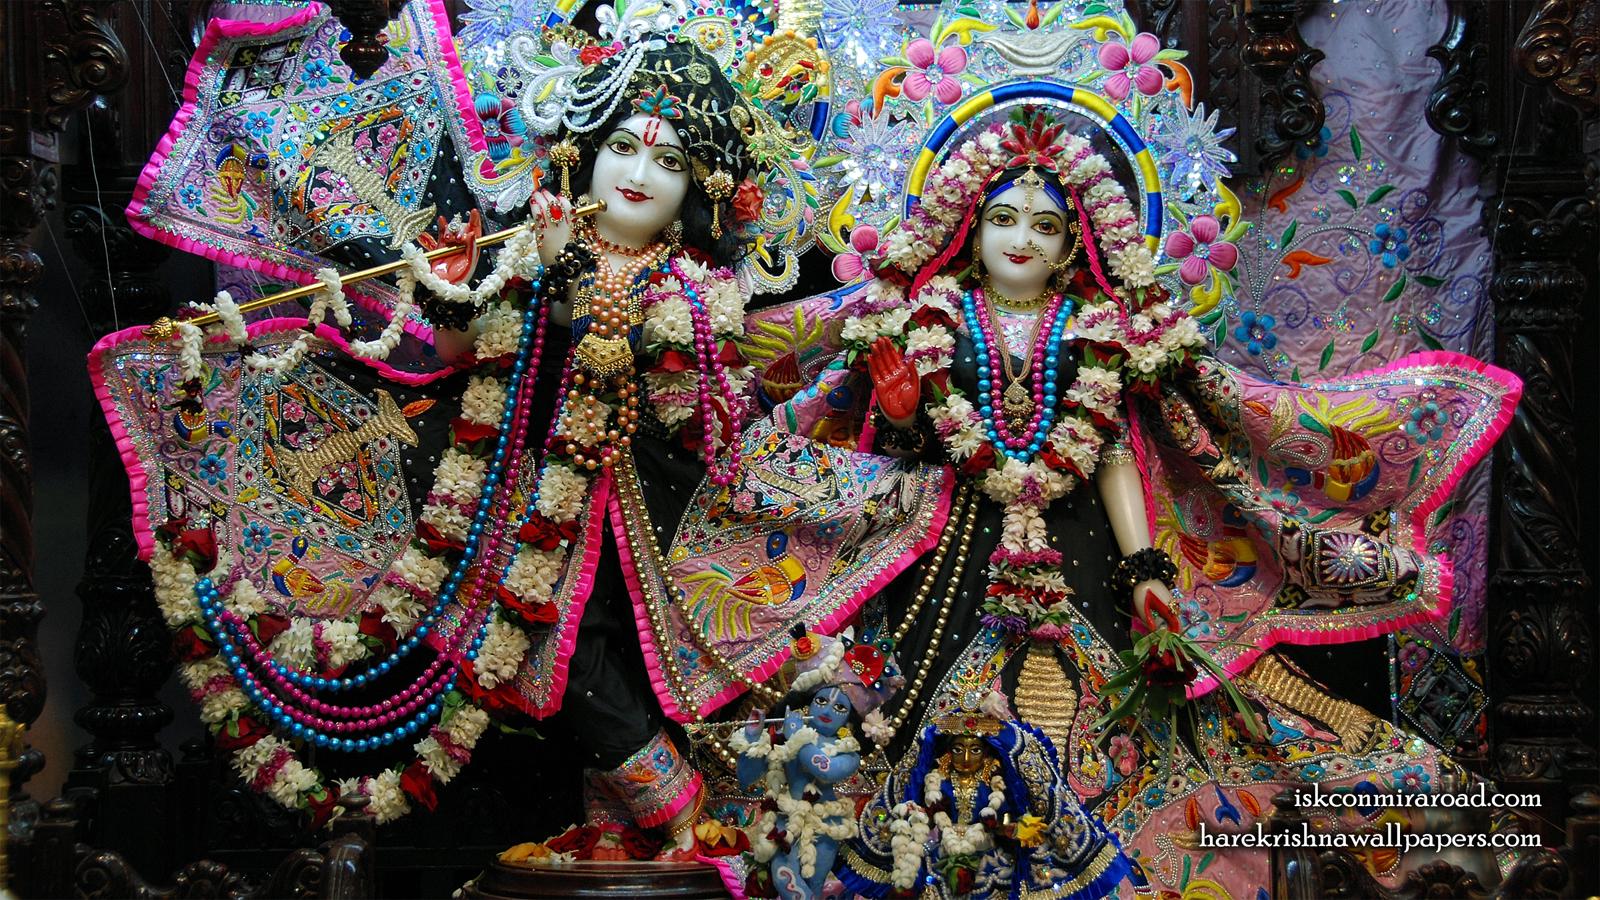 Sri Sri Radha Giridhari Wallpaper (019) Size 1600x900 Download